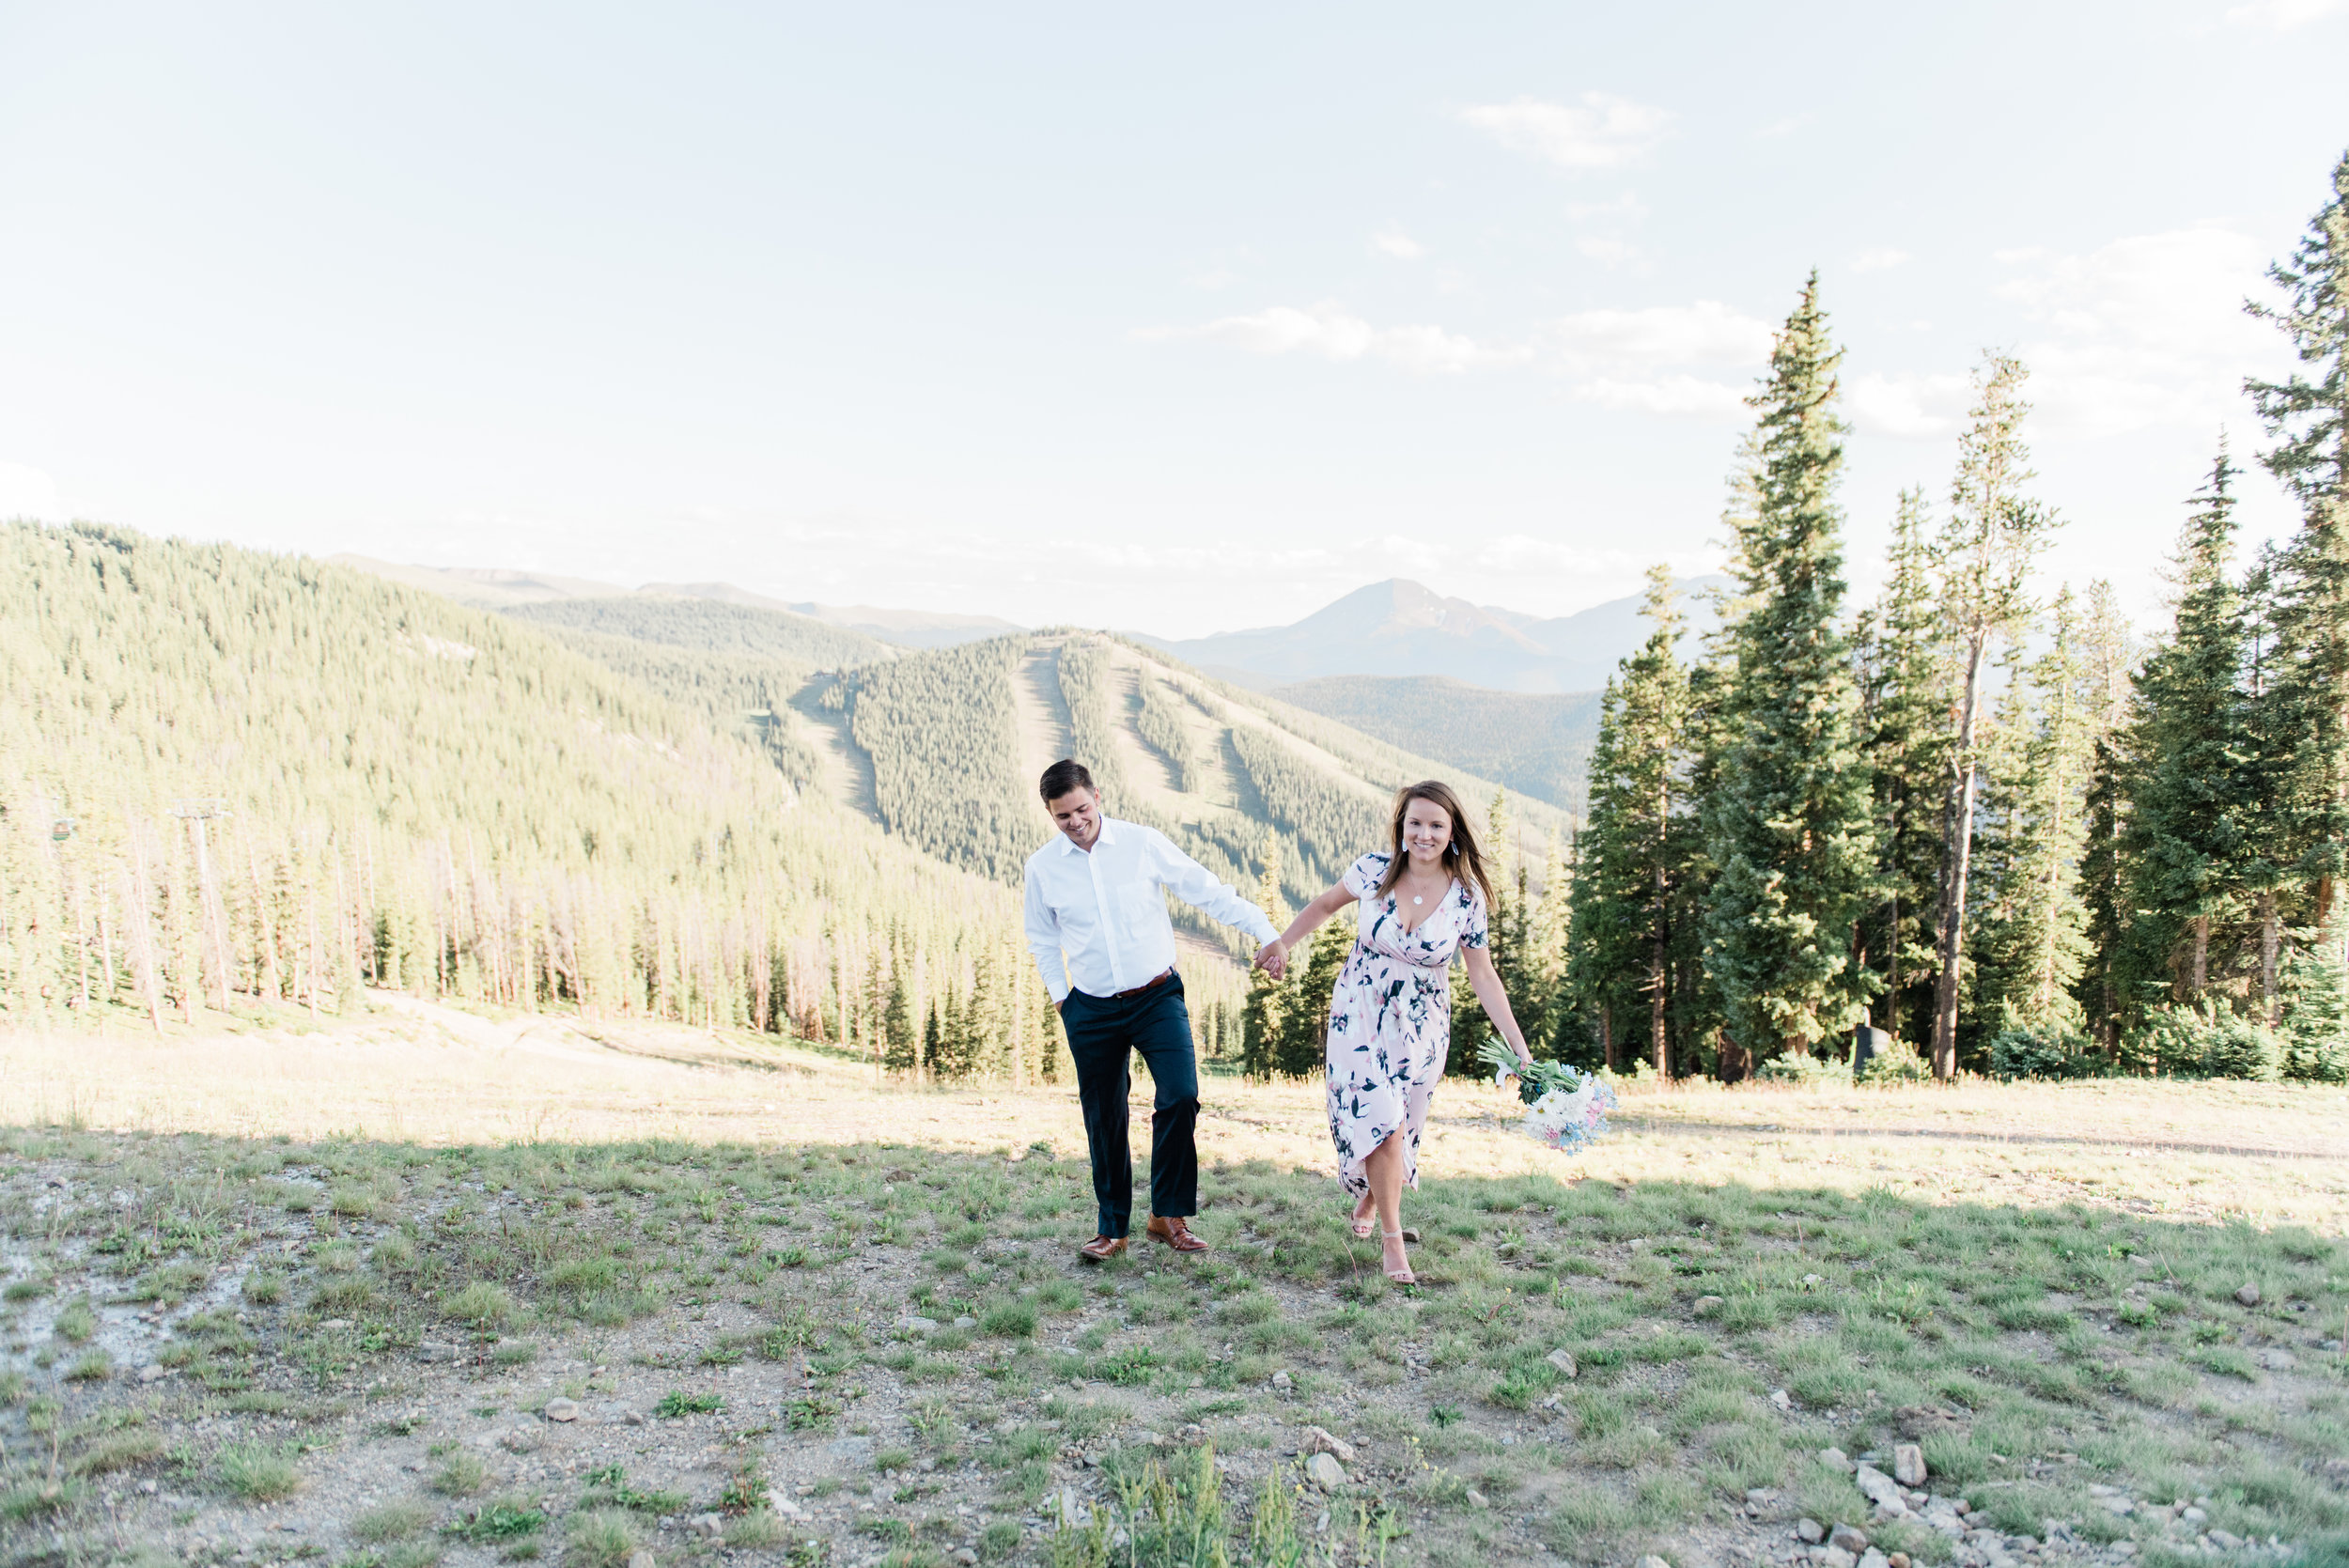 AshleighMillerPhotography-Adventure-Photography-Session-Elle-Christian-Colorado-22.jpg